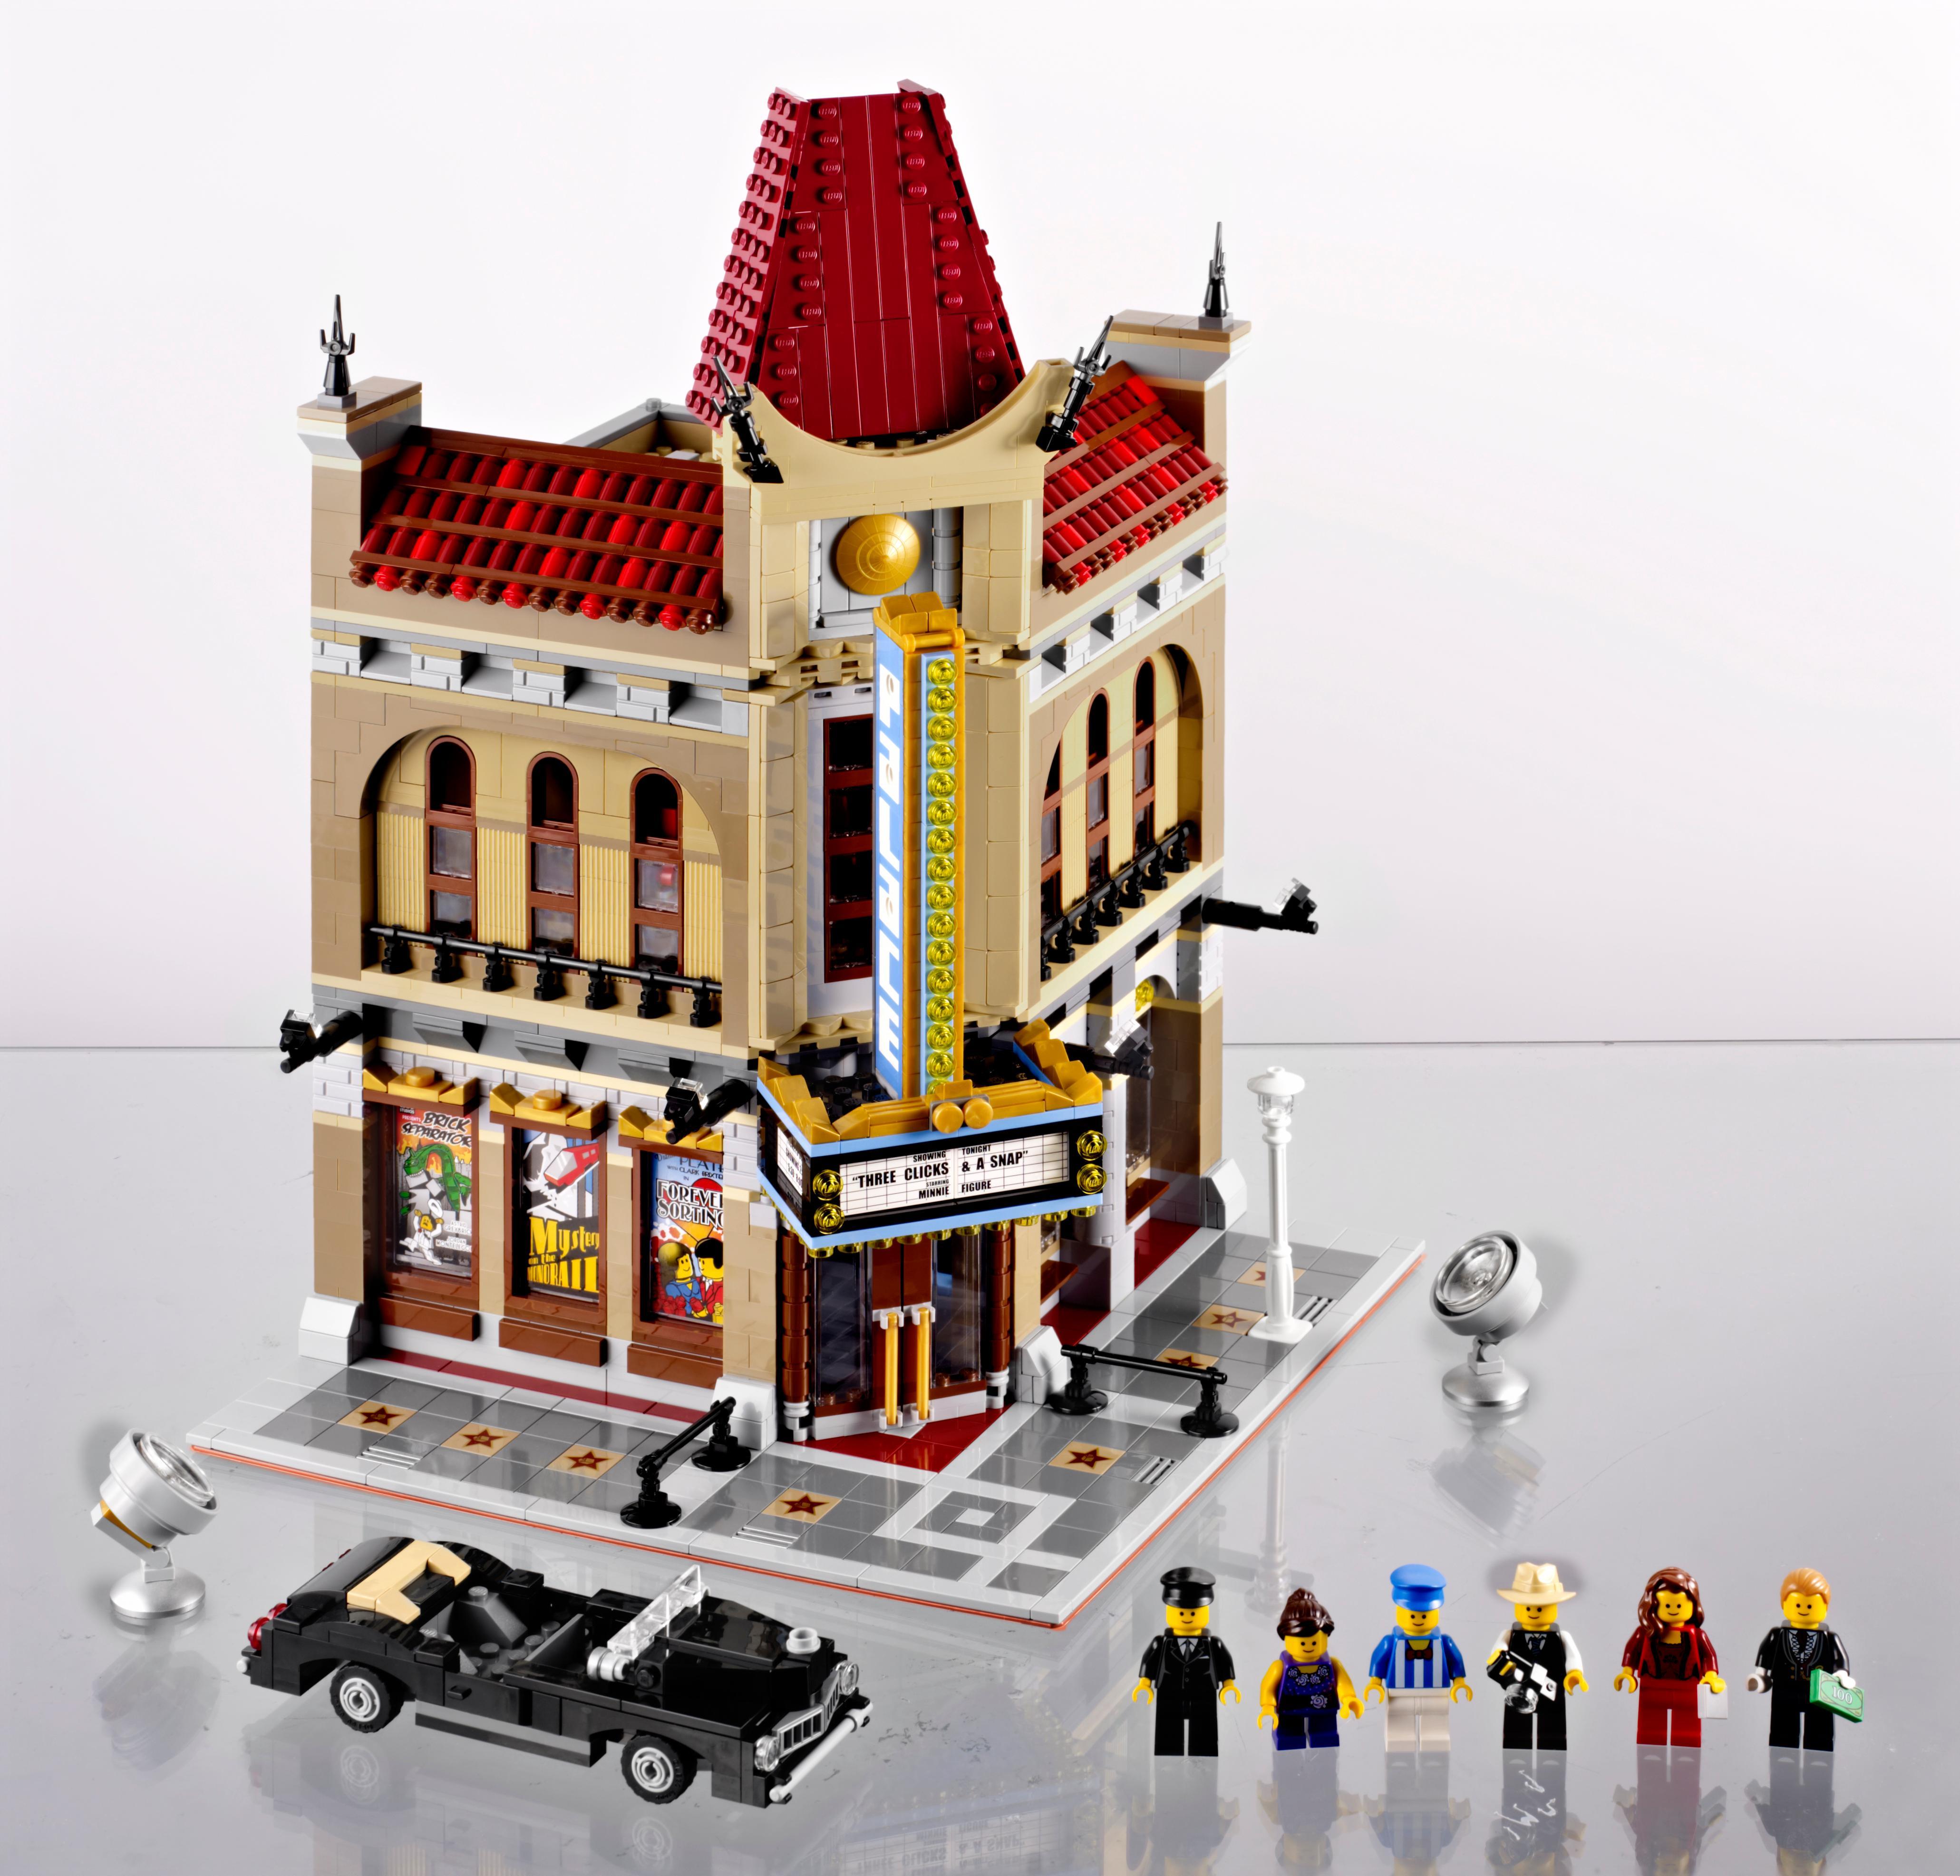 new lego creator 10232 palace cinema ebay. Black Bedroom Furniture Sets. Home Design Ideas